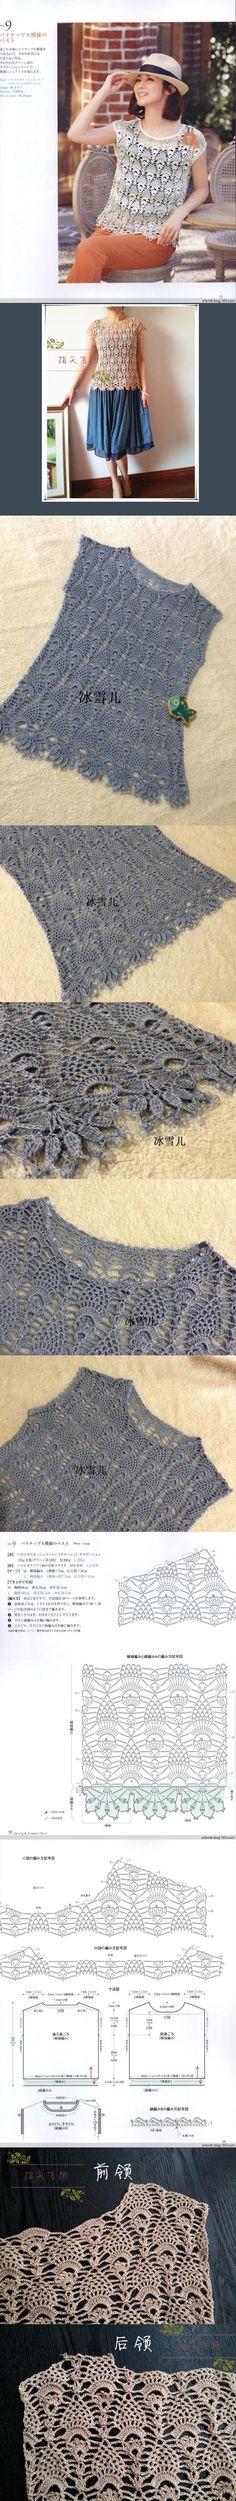 Crochet Top with Pineapple stitch - 类: 女士夏钩衫 标签:罗莎琳达爱尔兰蕾丝 鱼 举报 字